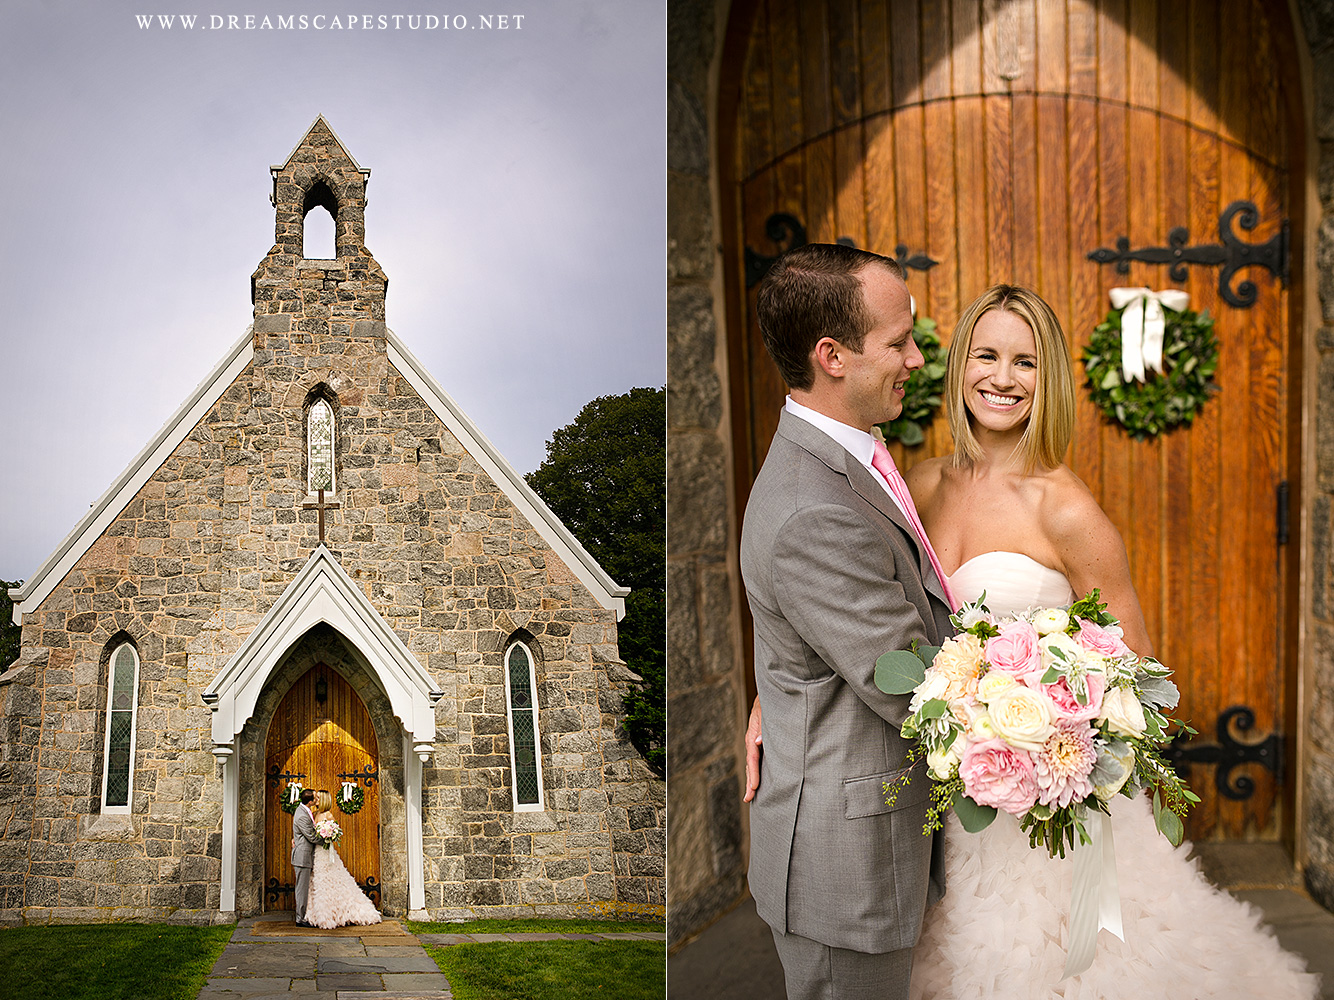 CT_Wedding_Photographer_ZBJi_Blg_11.jpg